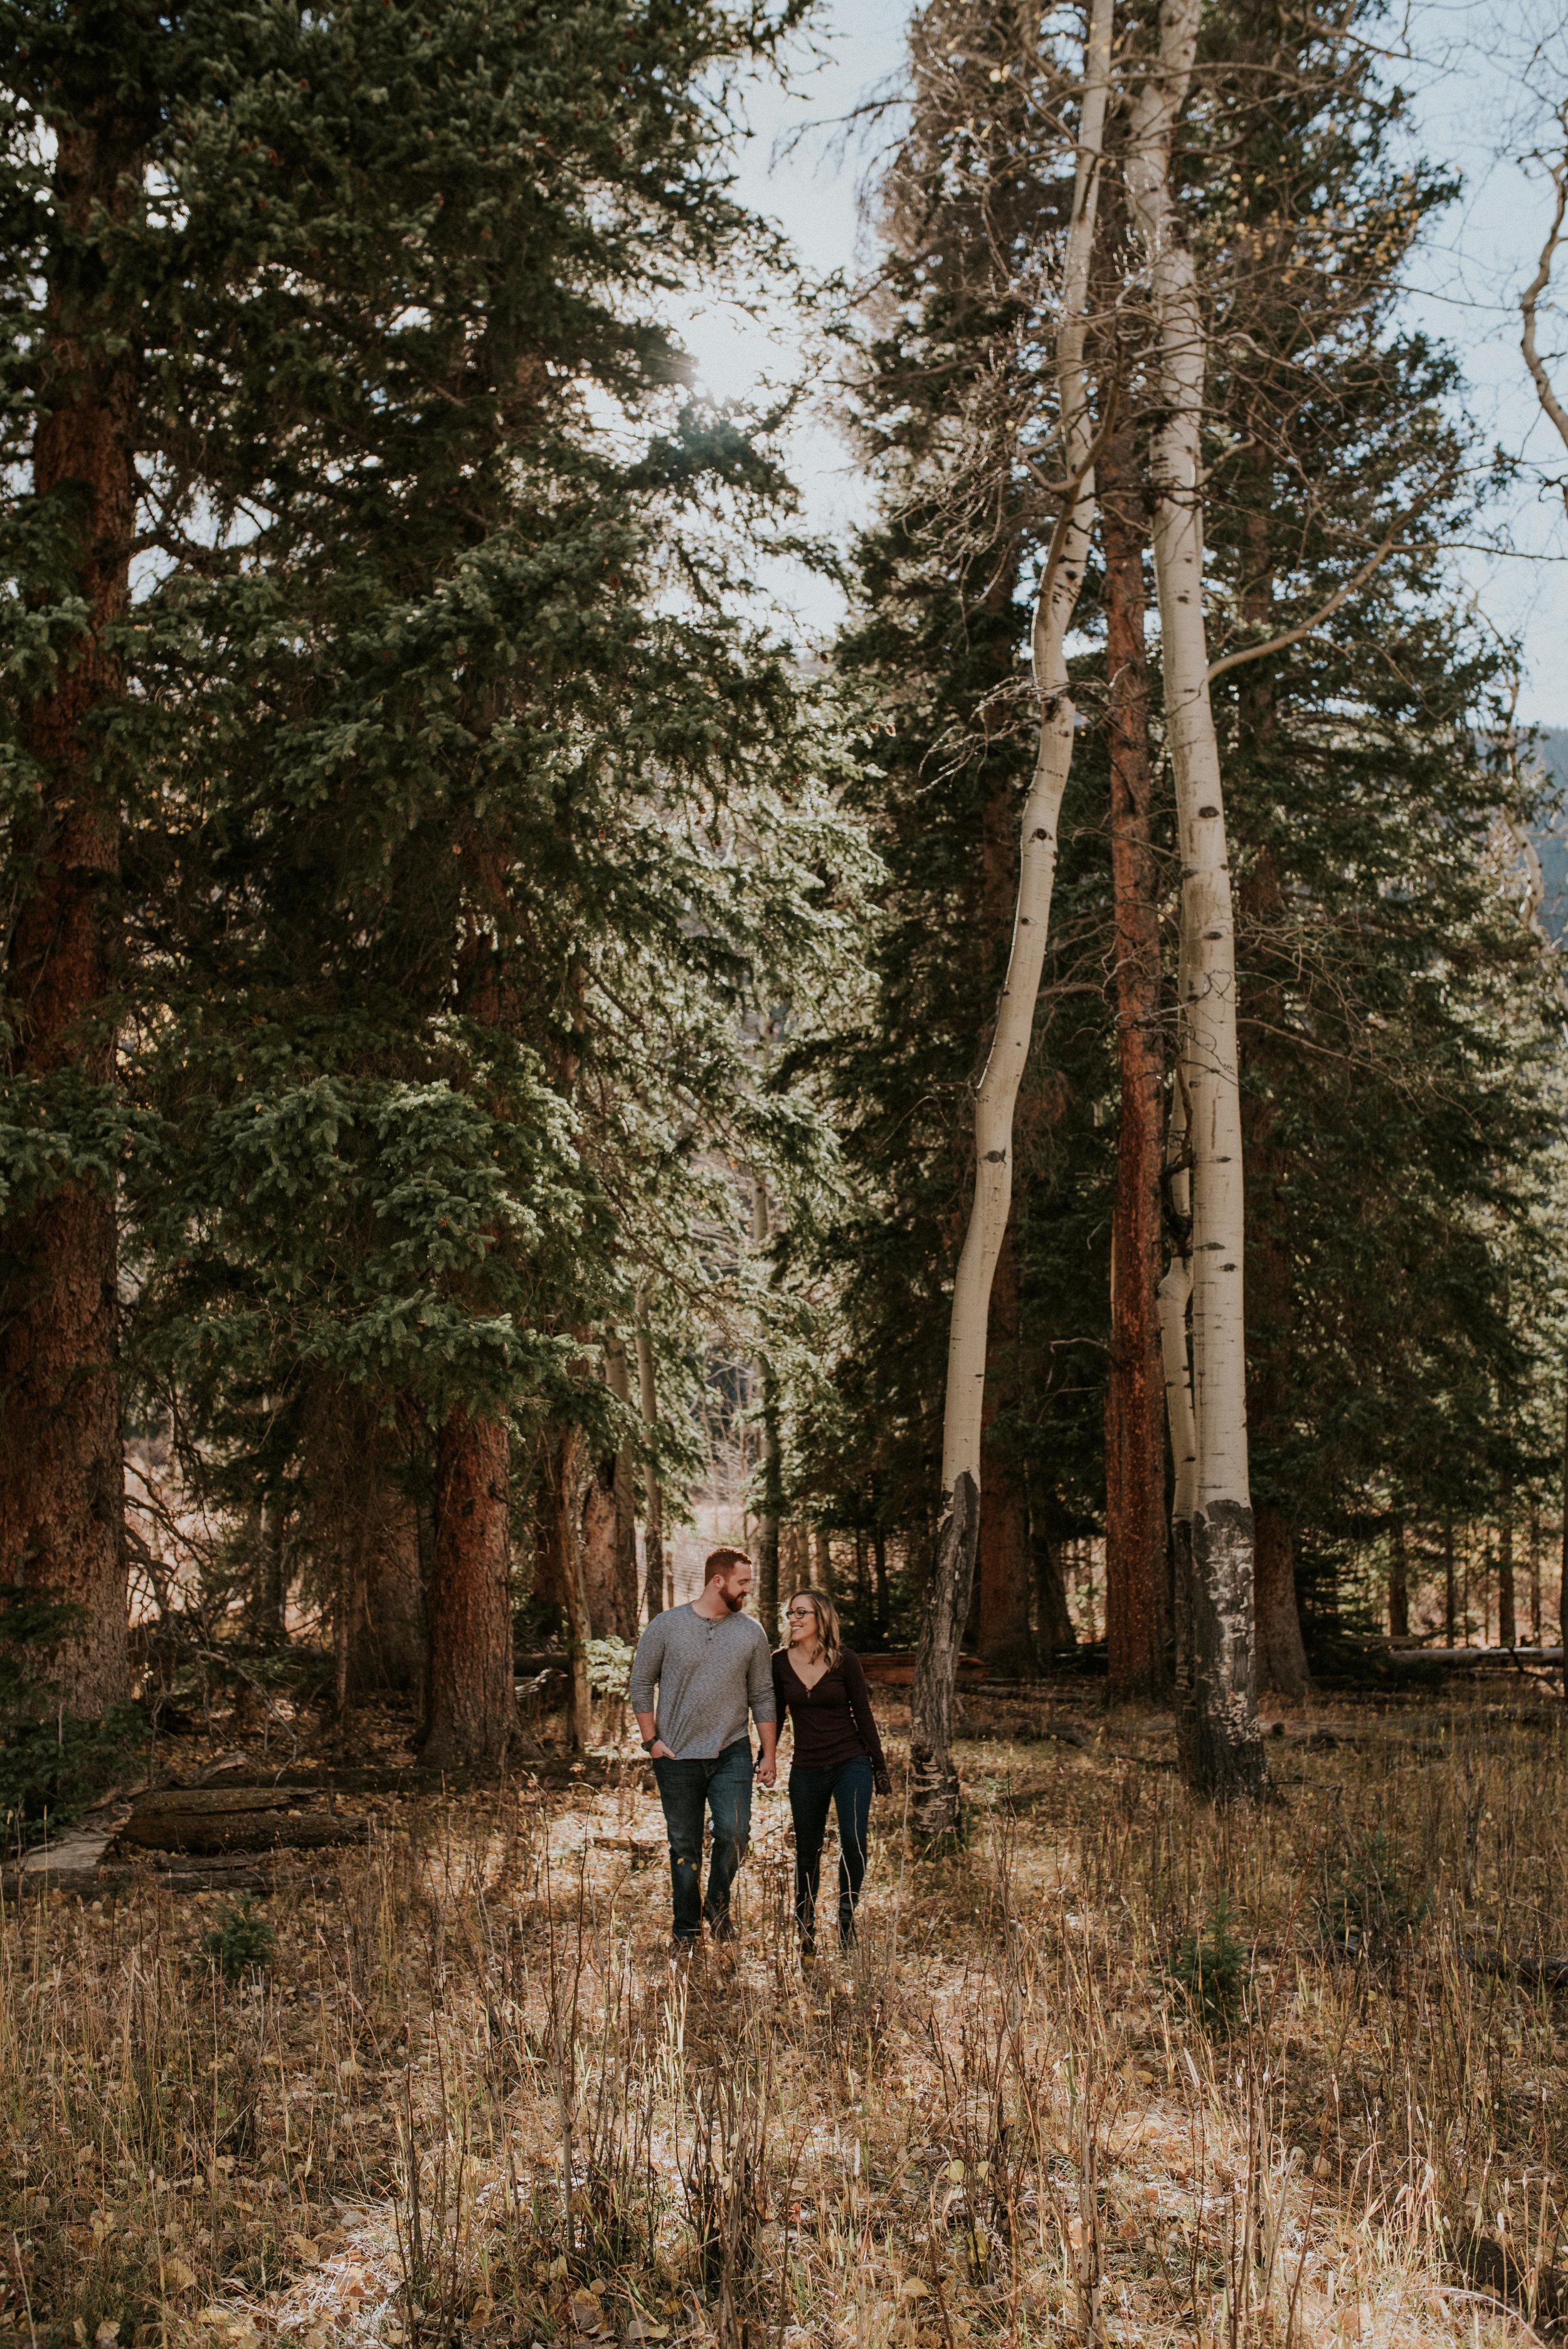 Romantic Windy Rocky Mountain National Park Engagement Photographer-4 (2).jpg